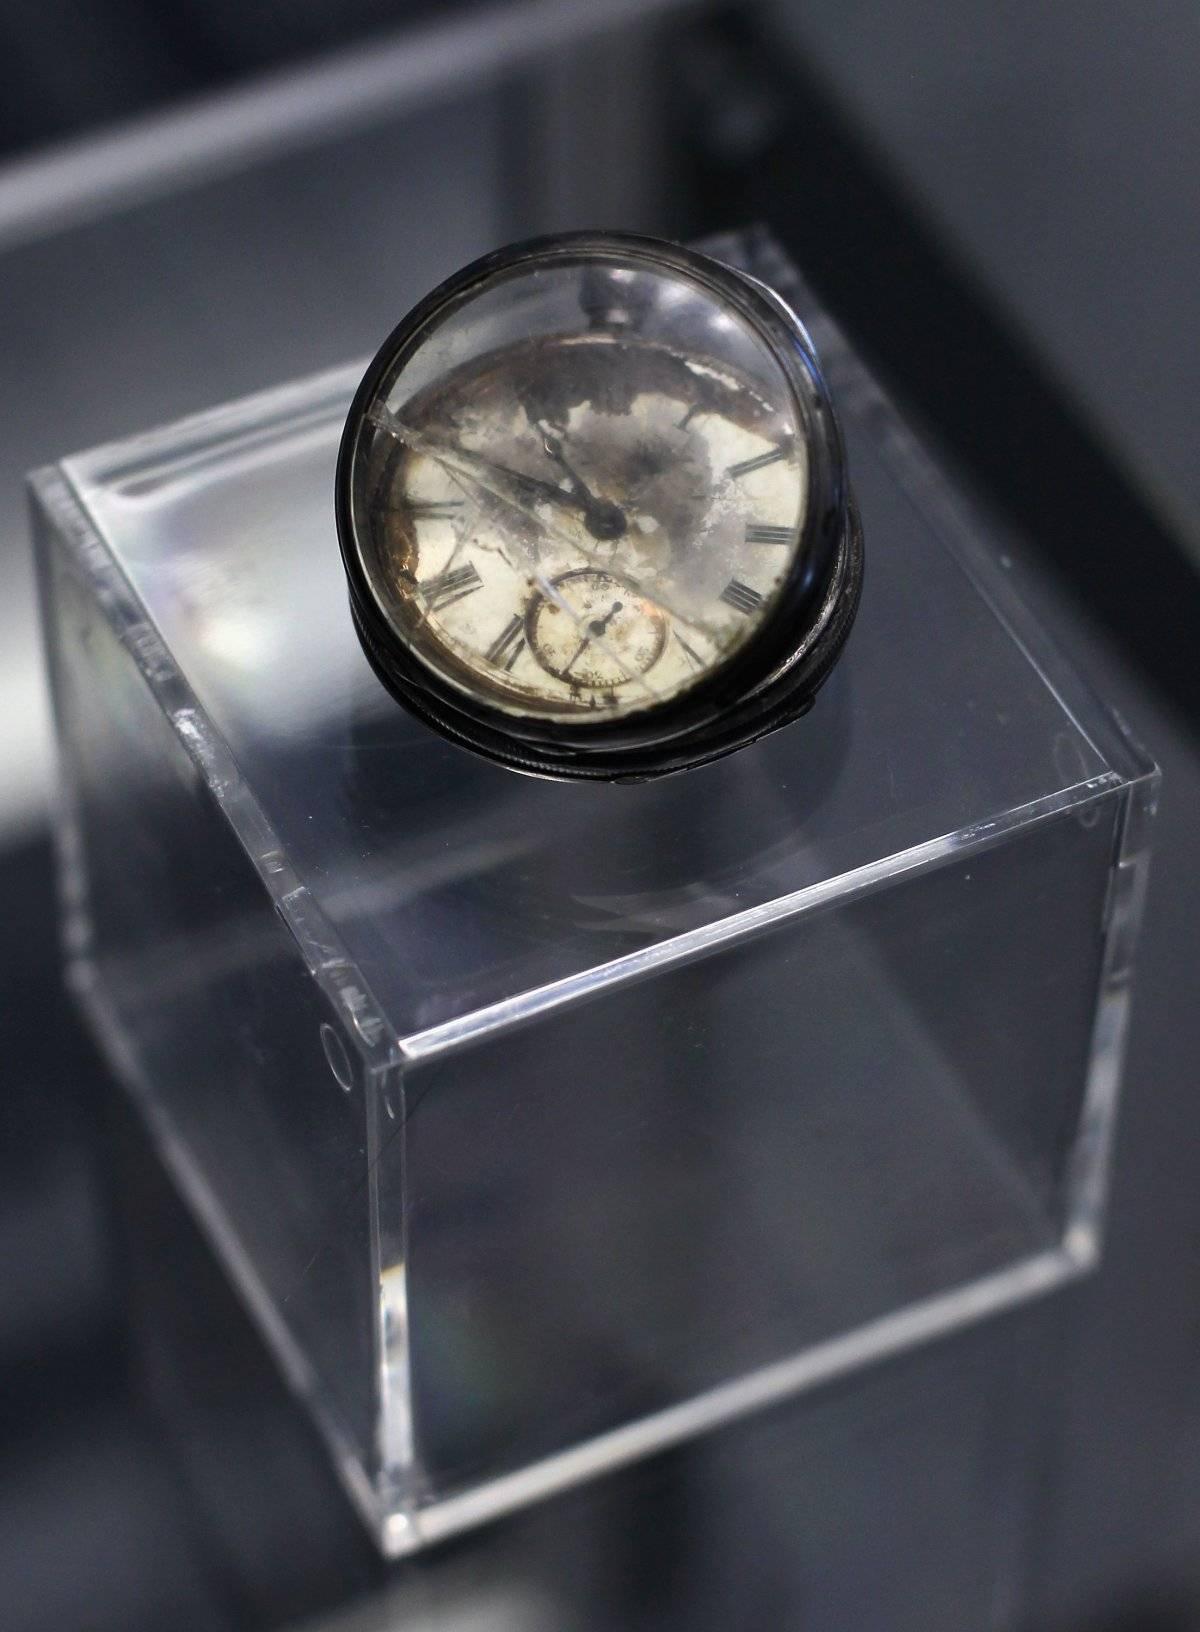 Un reloj de bolsillo recuperado del sitio de RMS Titanic Foto: Getty Images